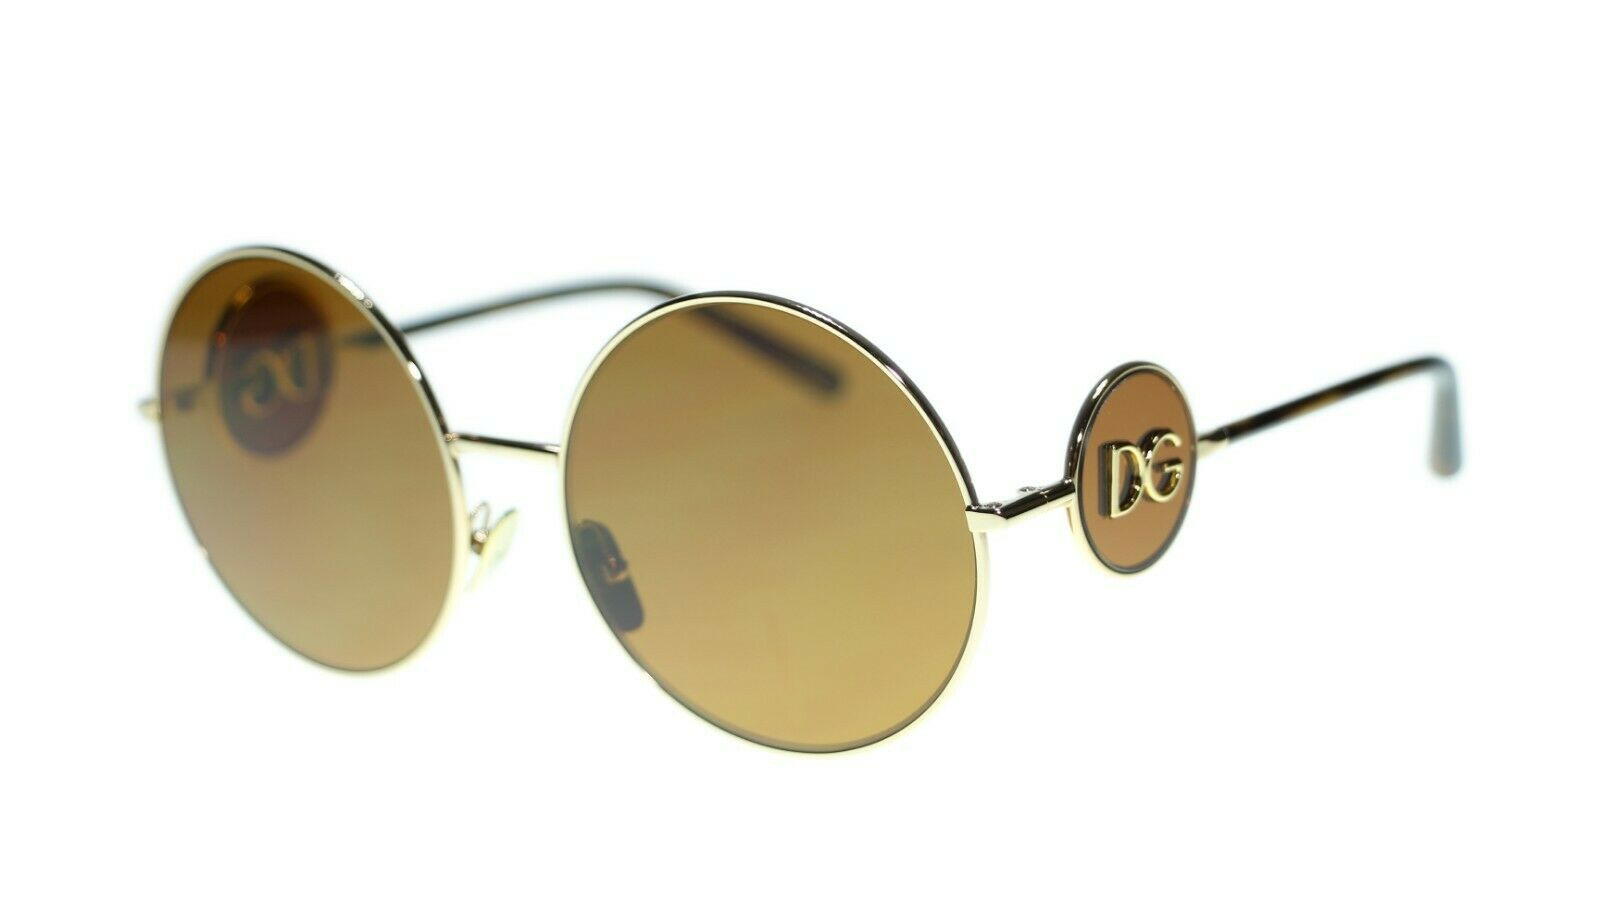 Dolce Gabbana Women Sunglasses DG2205 Authentic 59mm - $199.00